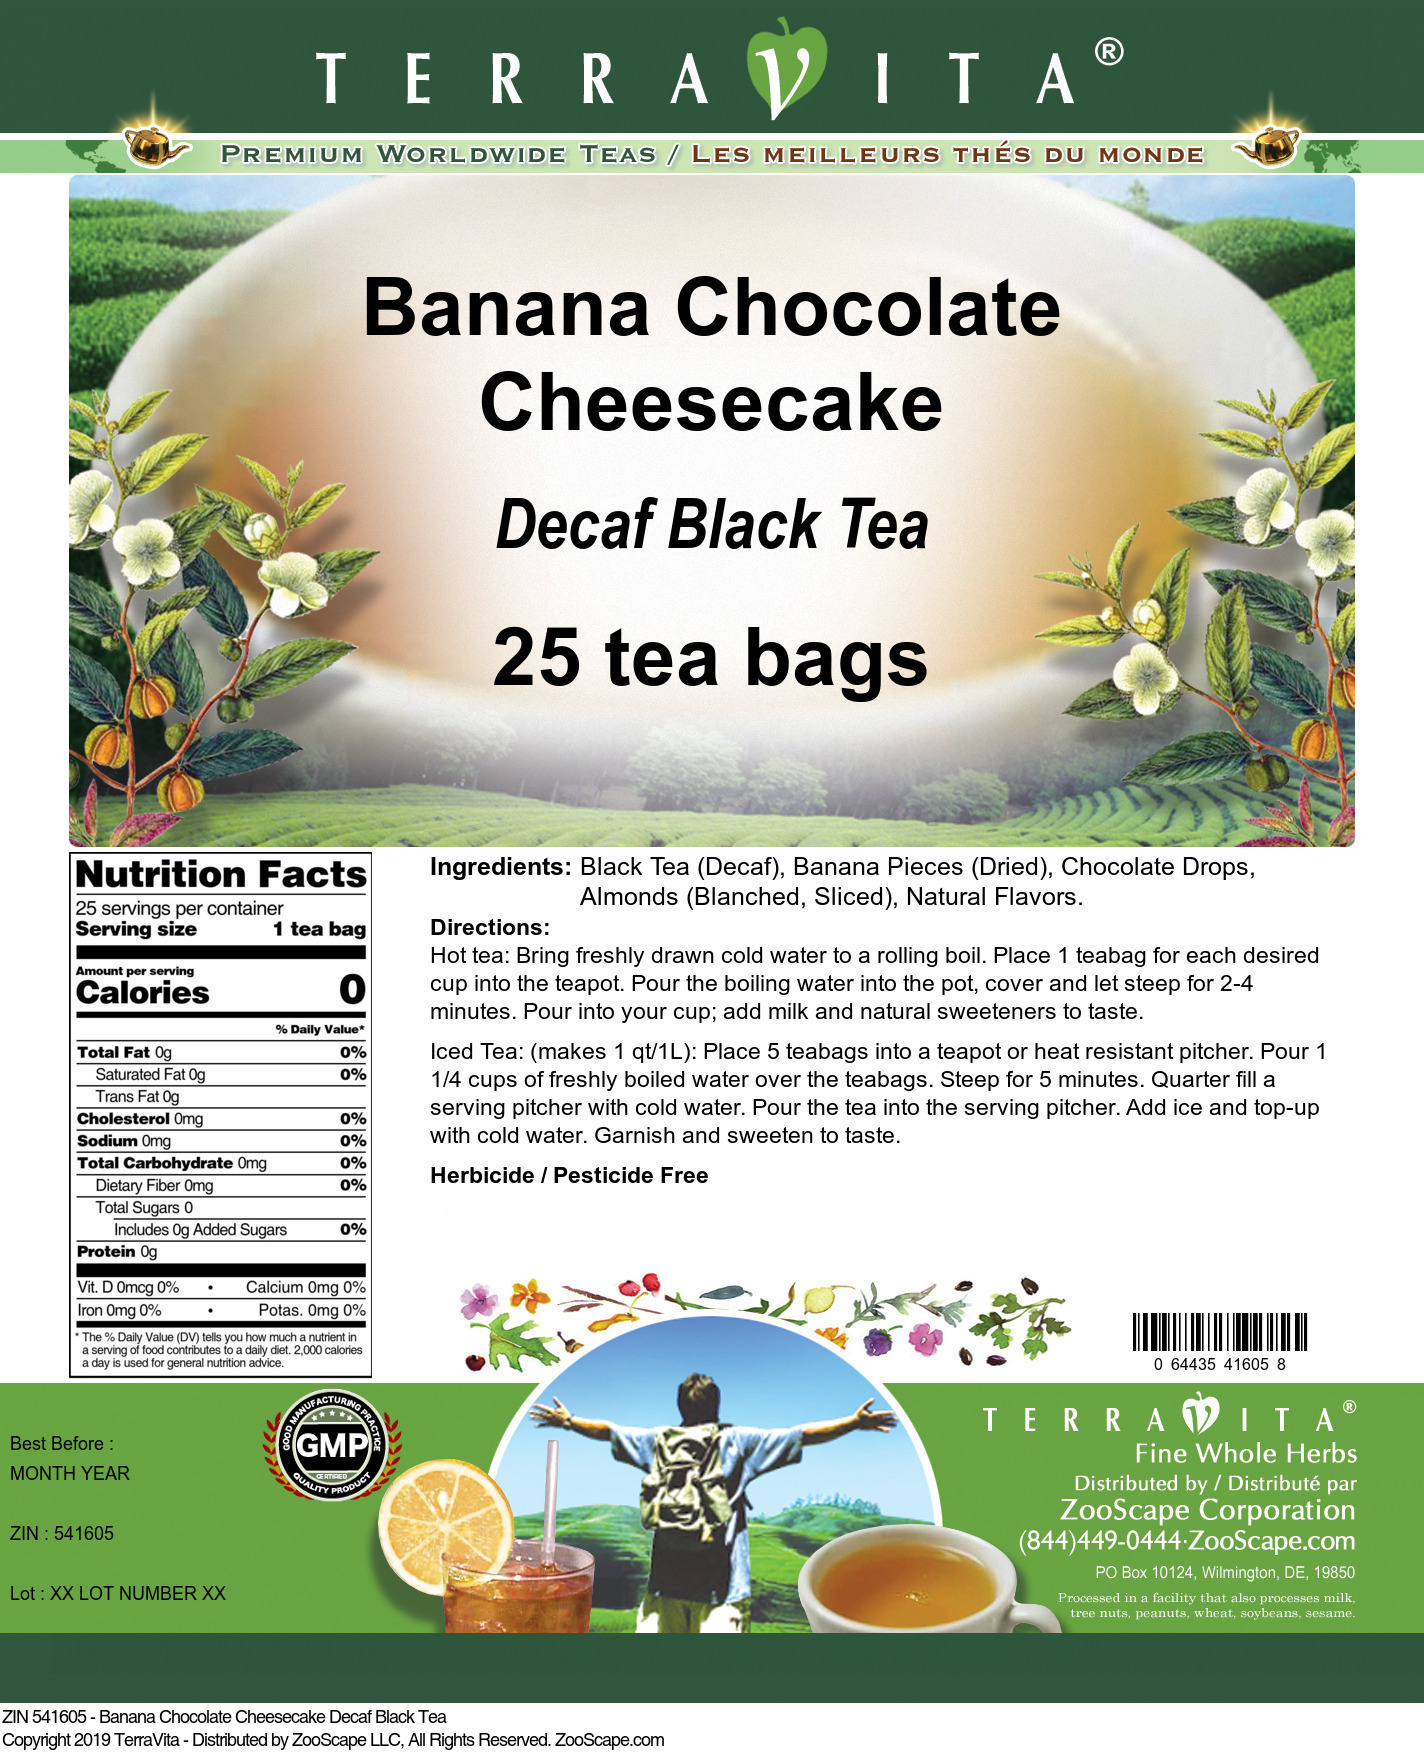 Banana Chocolate Cheesecake Decaf Black Tea